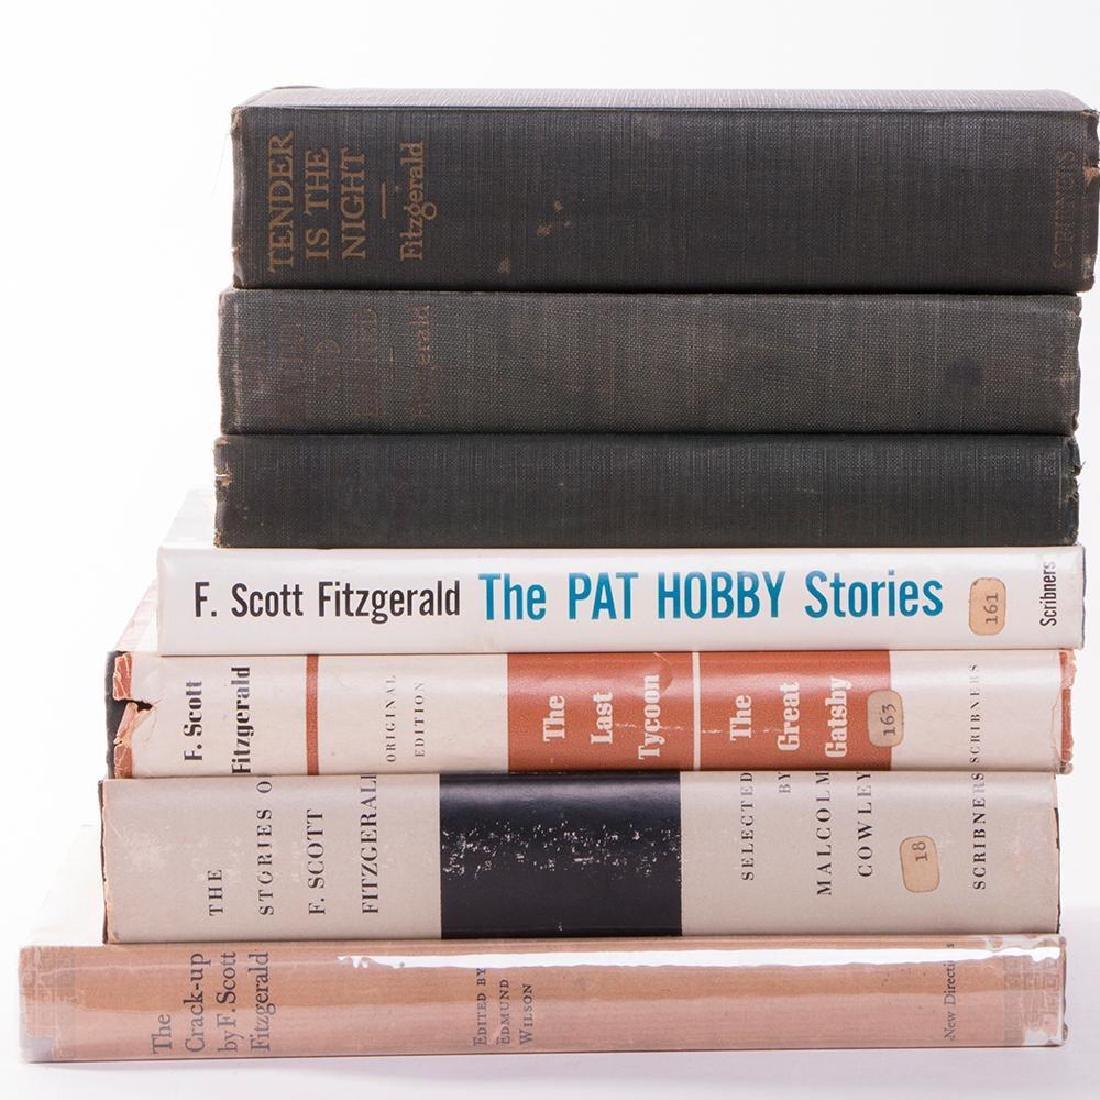 Seven works by F. Scott Fitzgerald